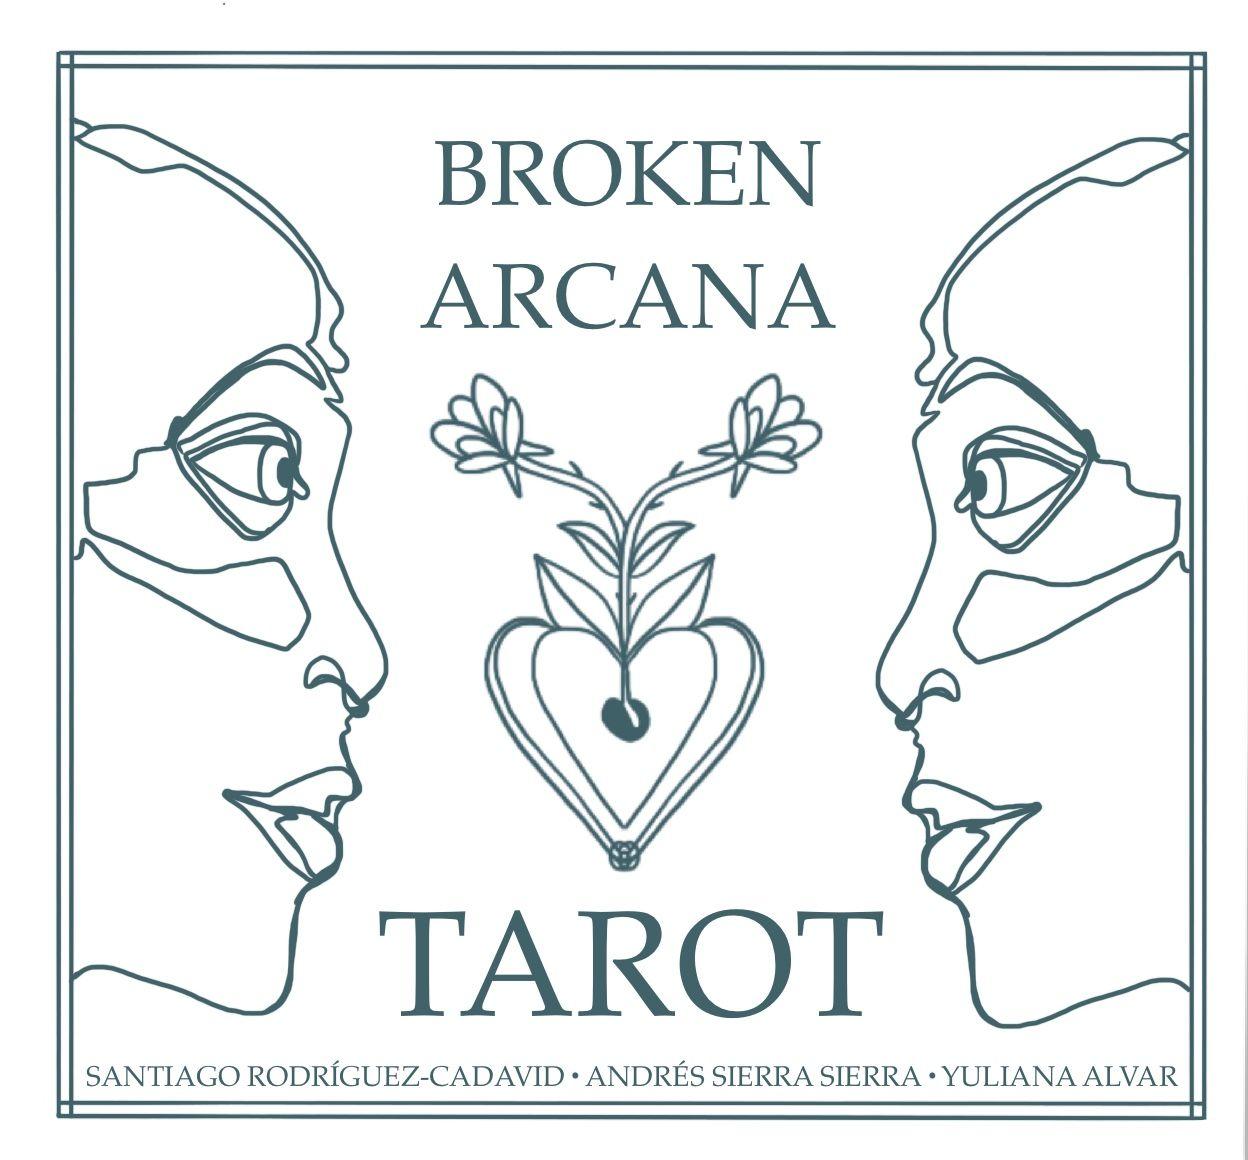 Broken Arcana